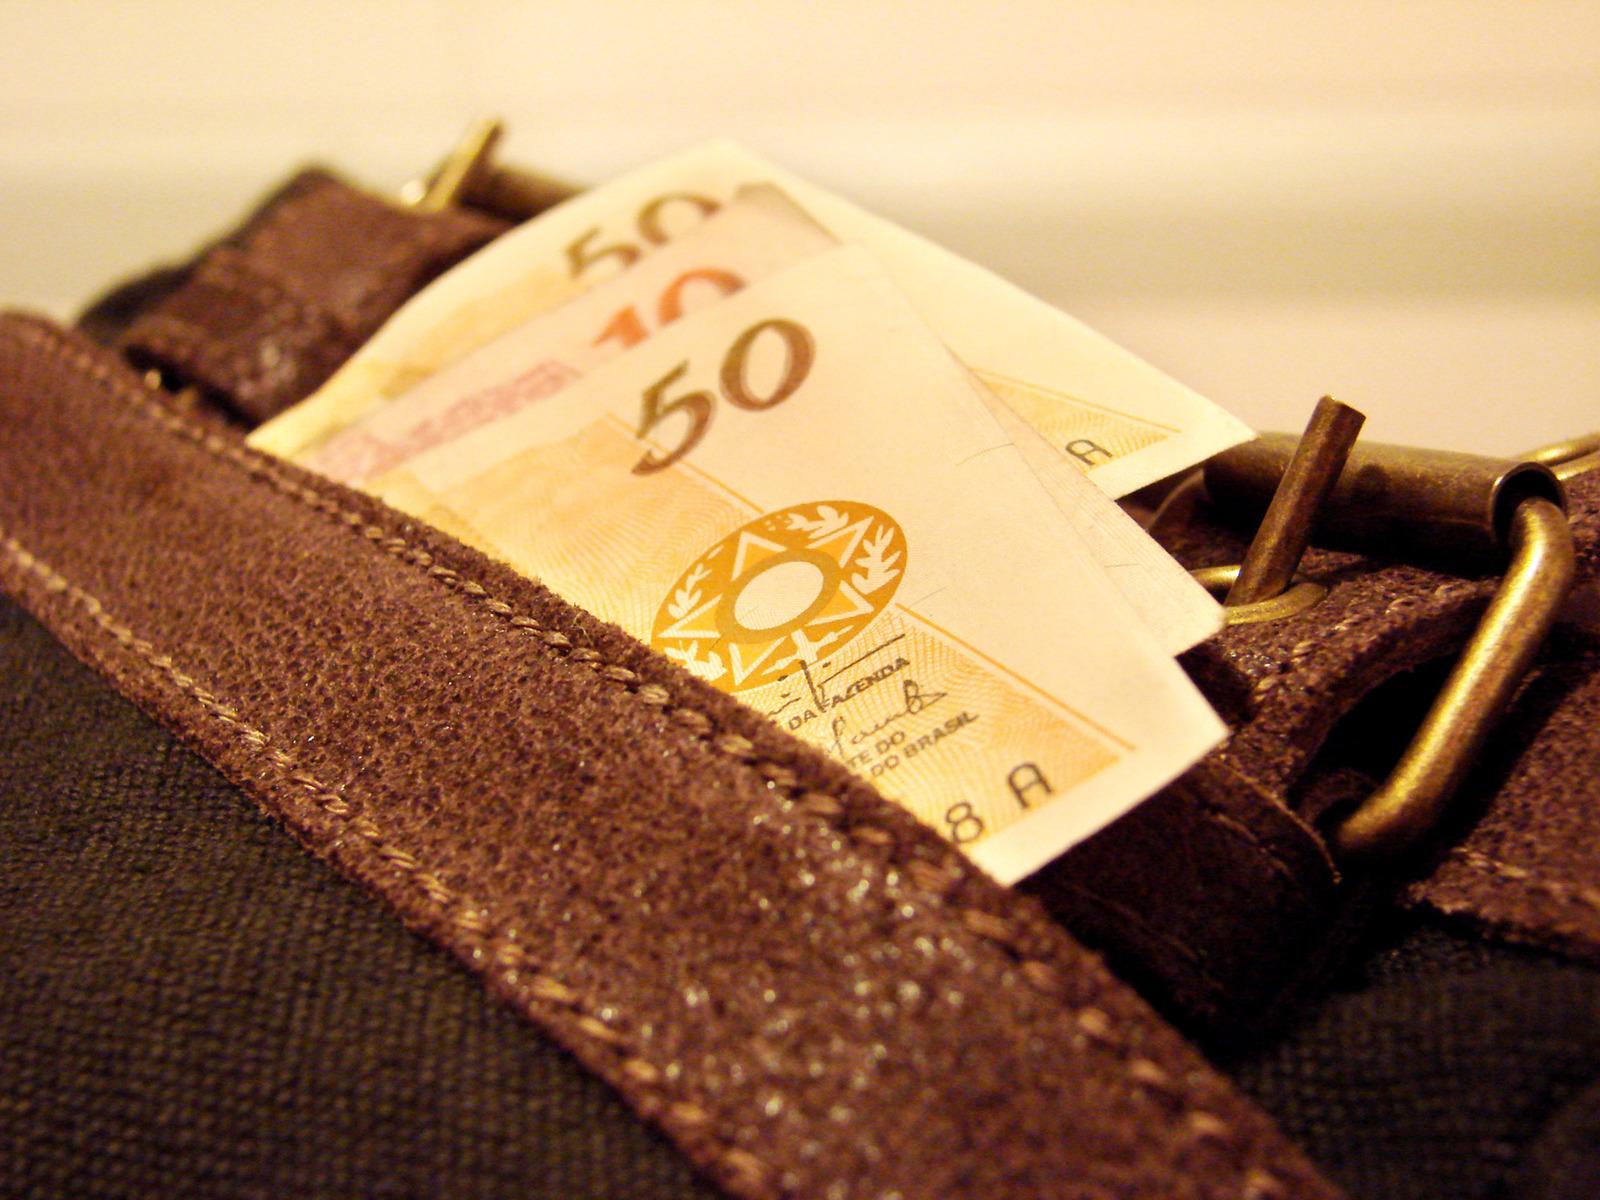 money-1056438-1600x1200.jpg